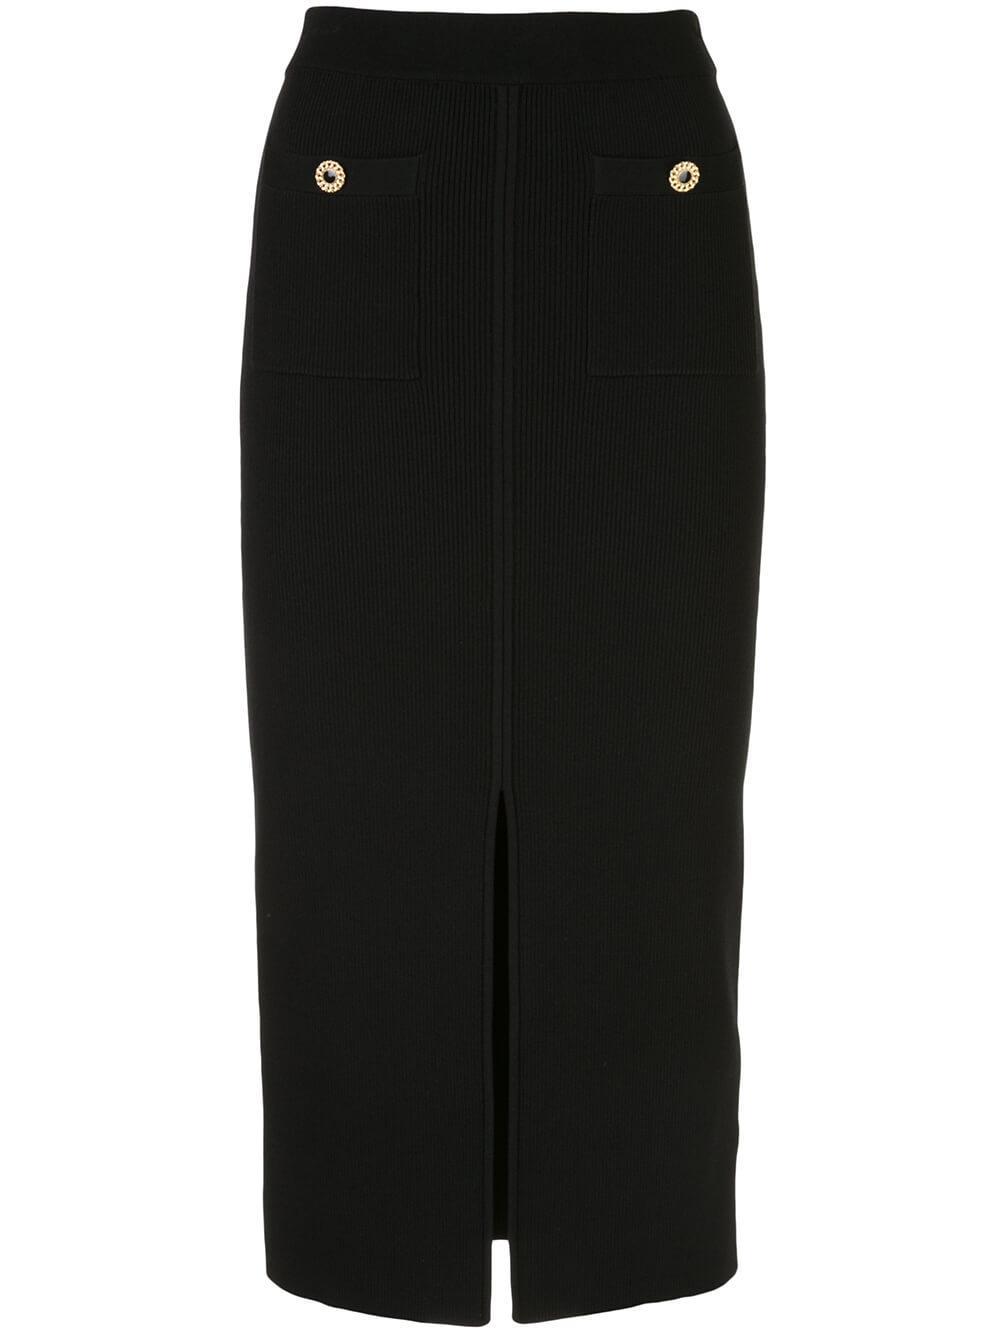 Rib Knit Front Slit Skirt Item # 120-3004-K